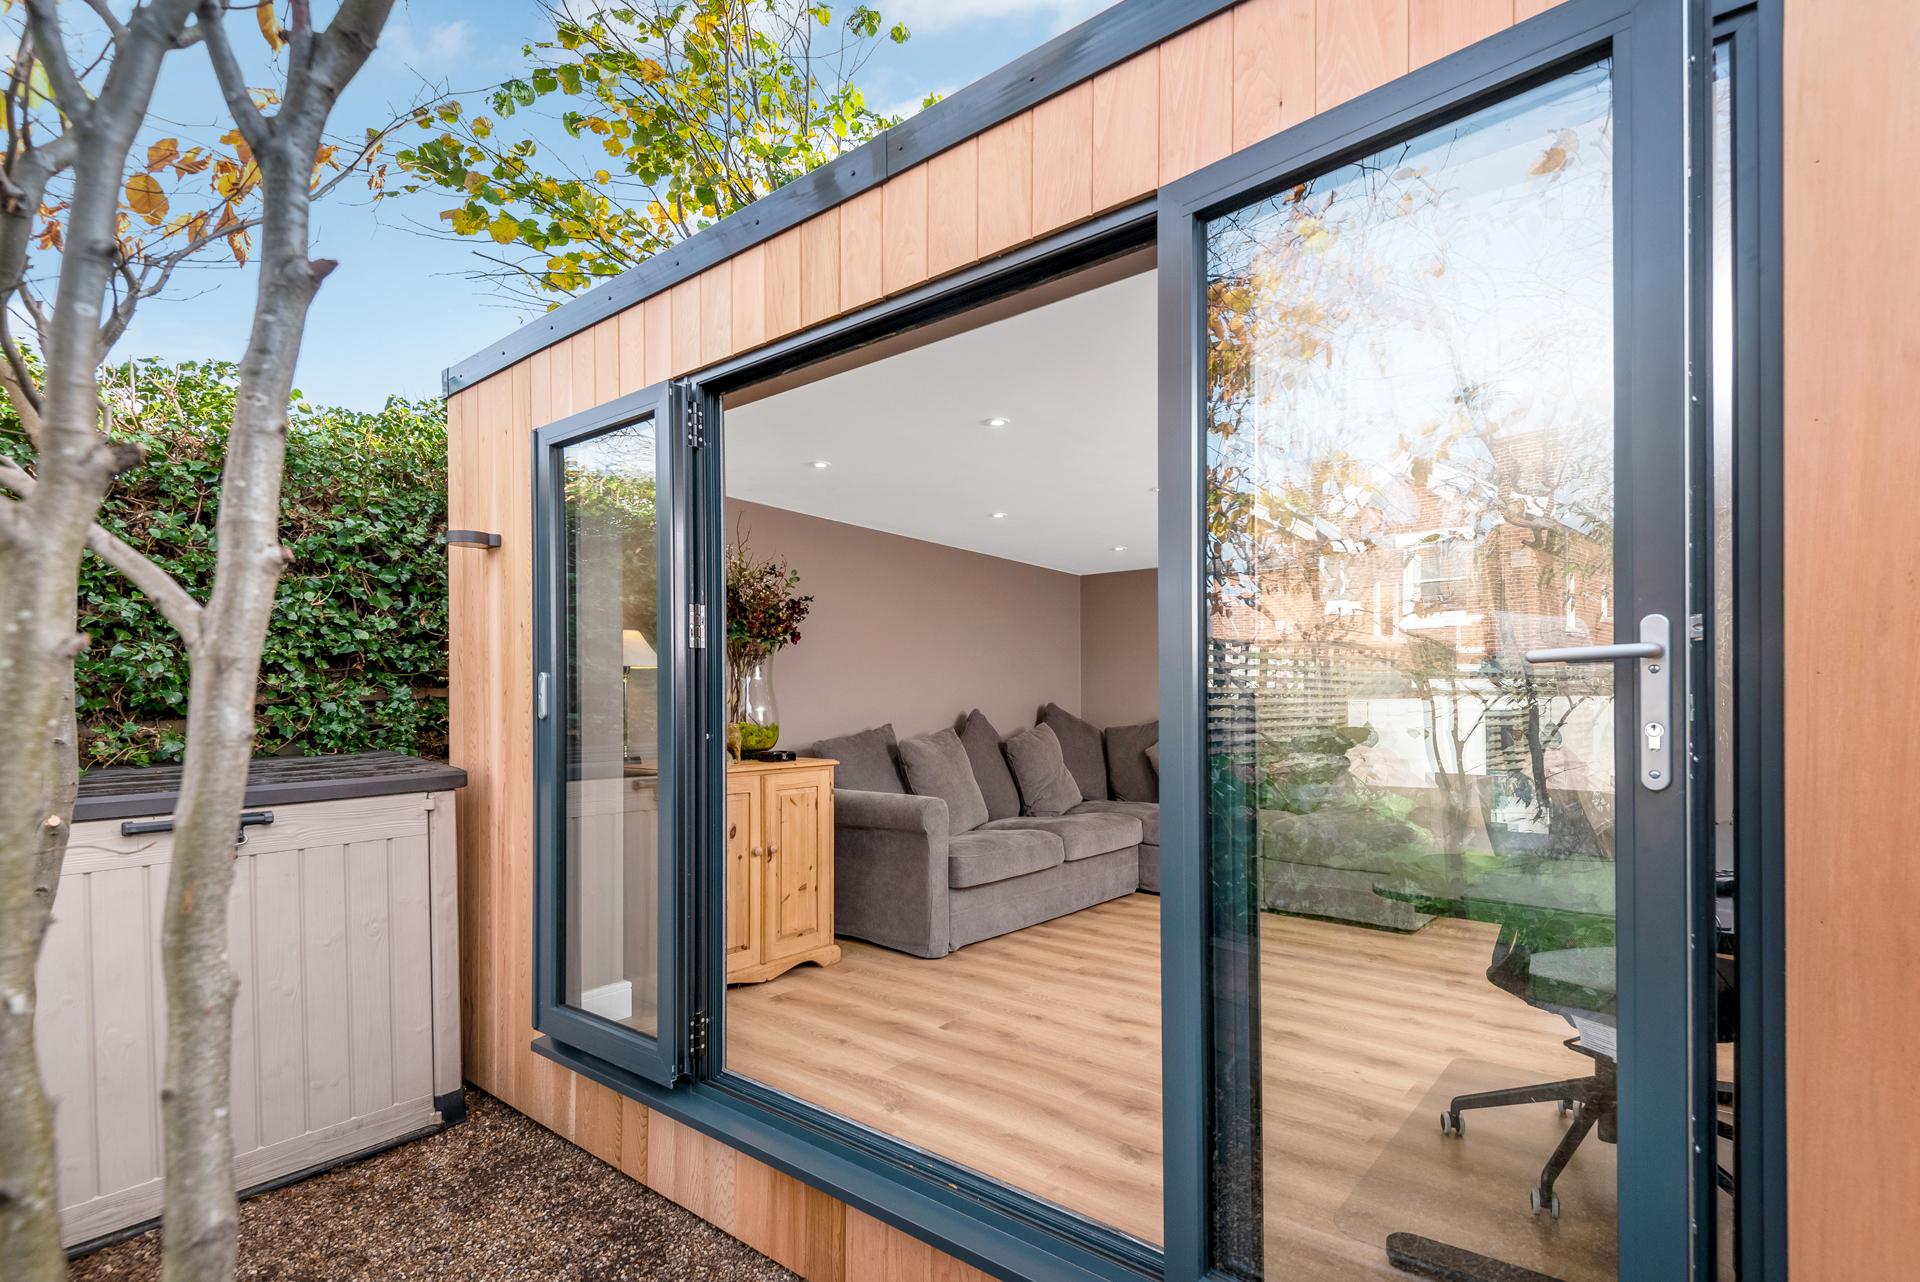 Garden rooms designed in Essex